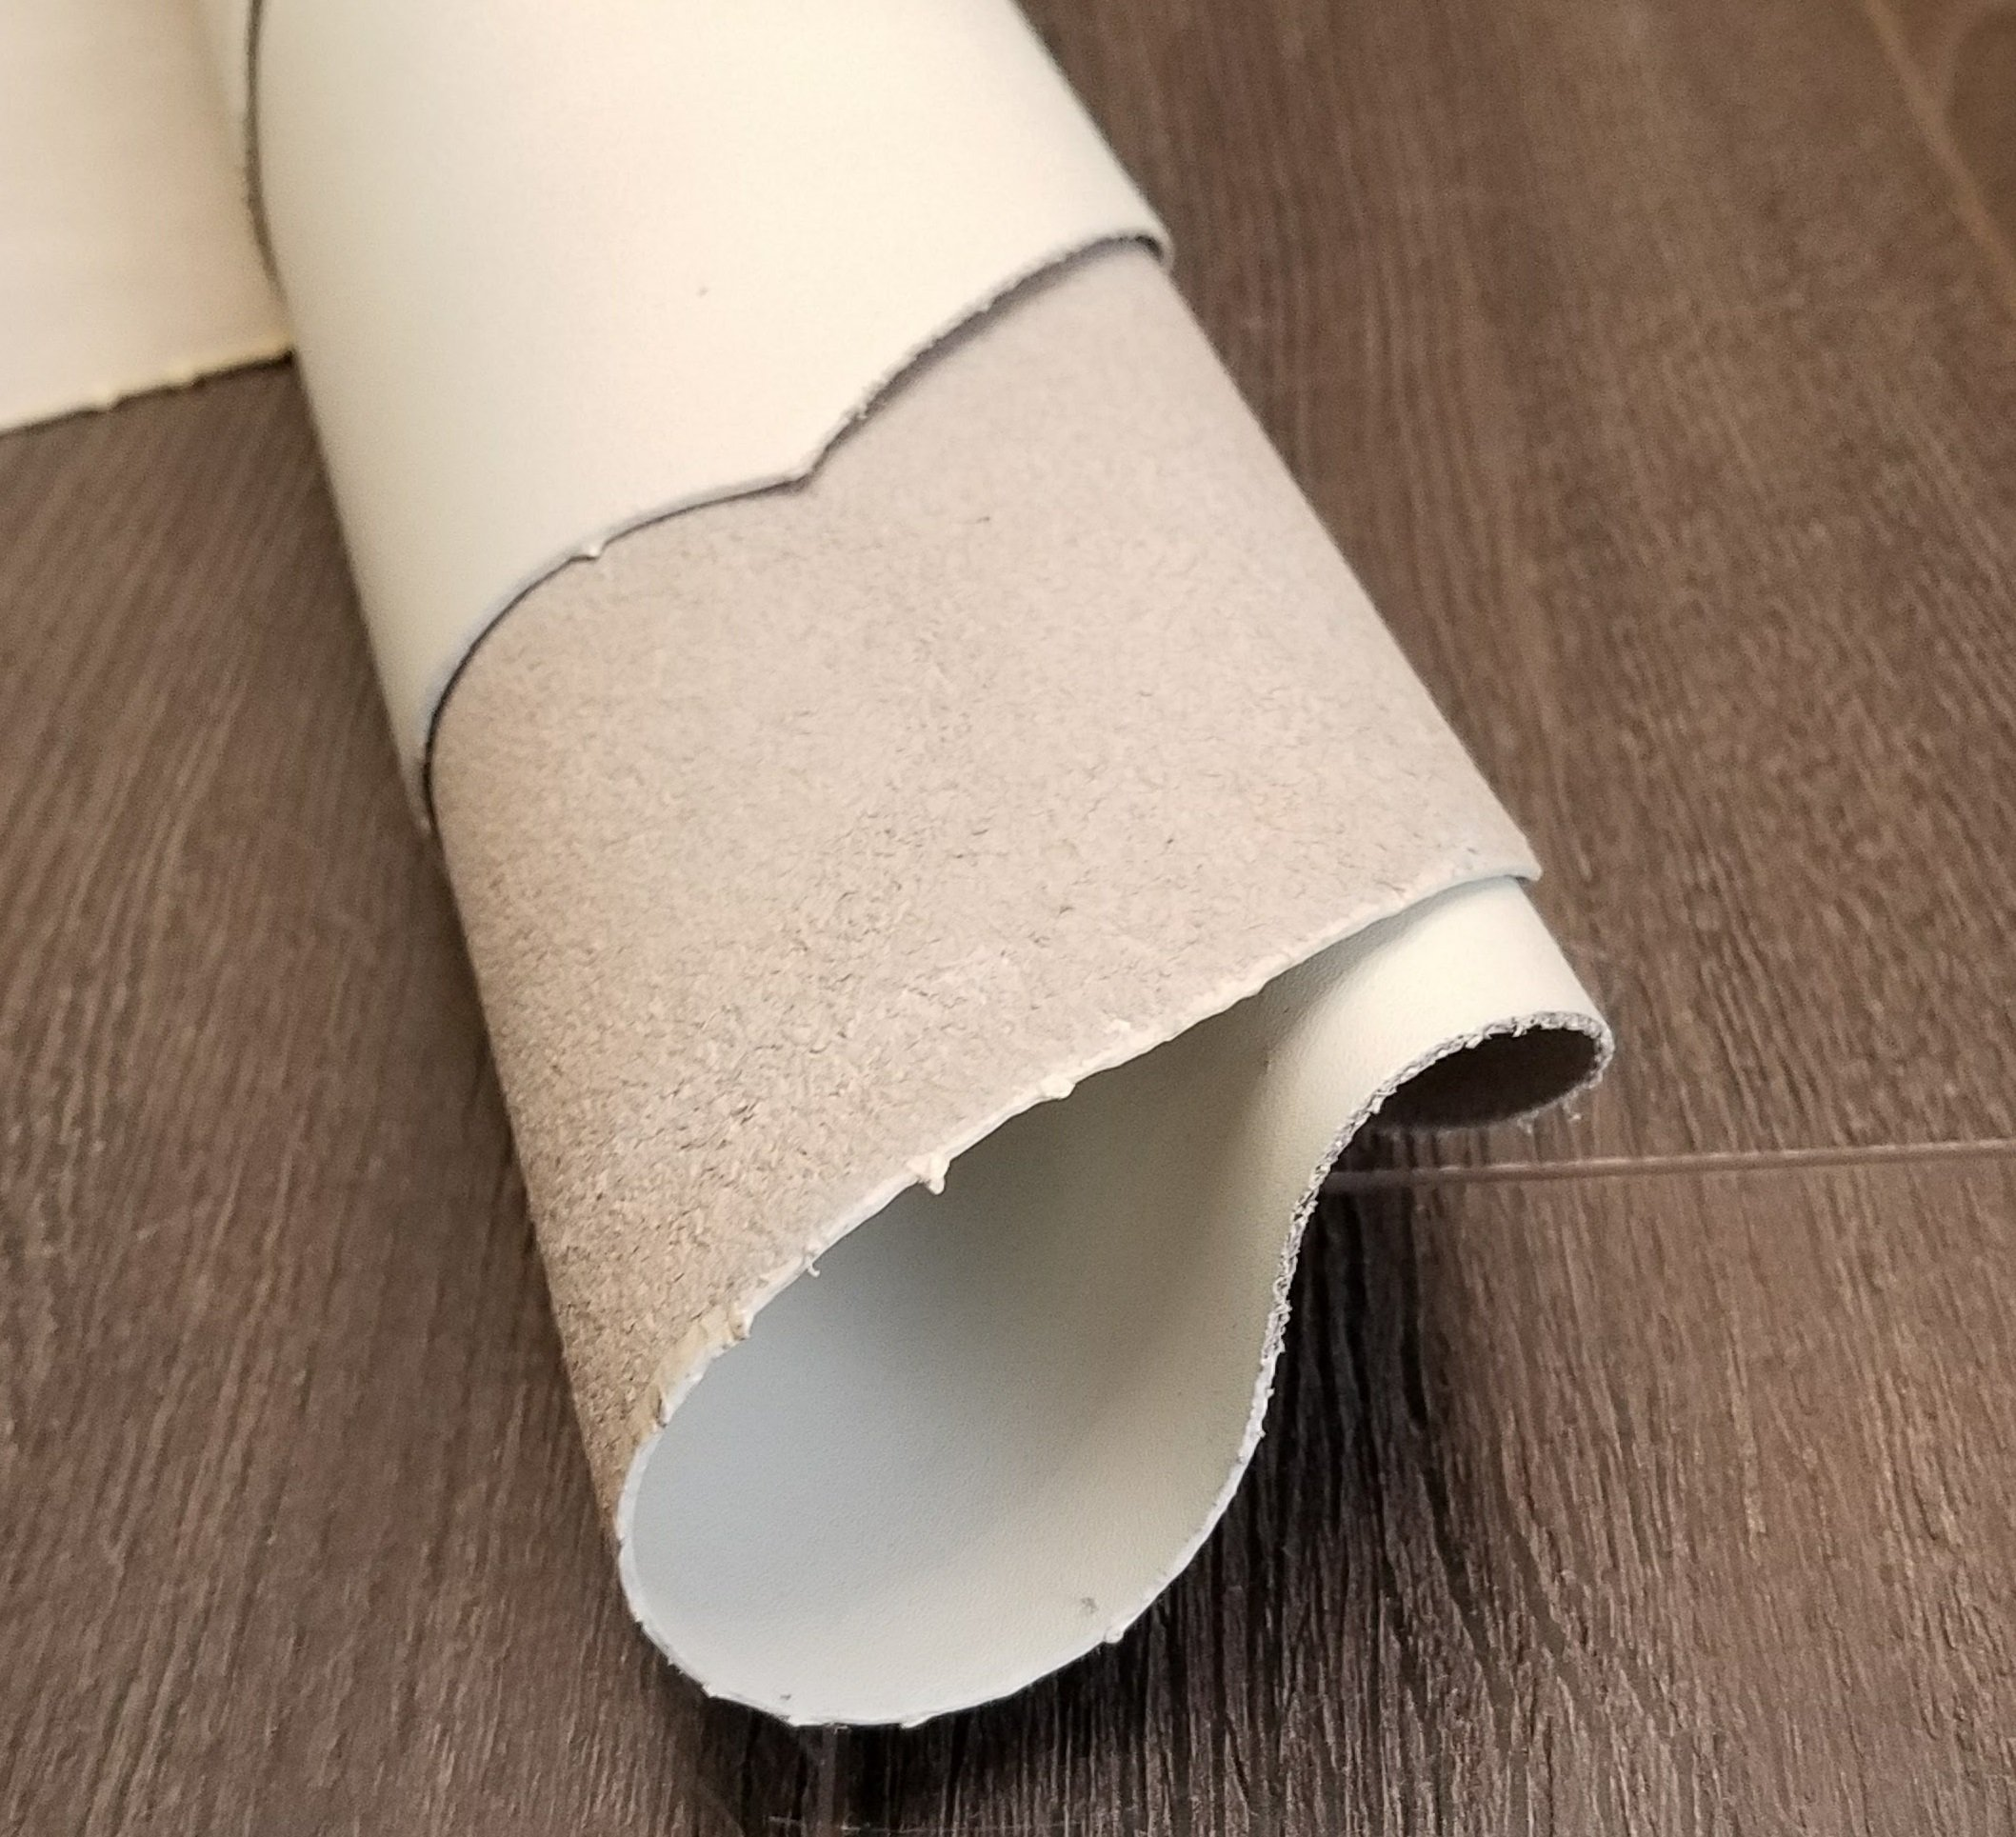 NAT Leathers White Offwhite Bone Smooth Nappa 3.0-3.5 oz 10-13 sq.ft. Footwear Shoe Handbag Craft Cowhide Genuine Cow Leather Hide Skin (10 sq.ft)